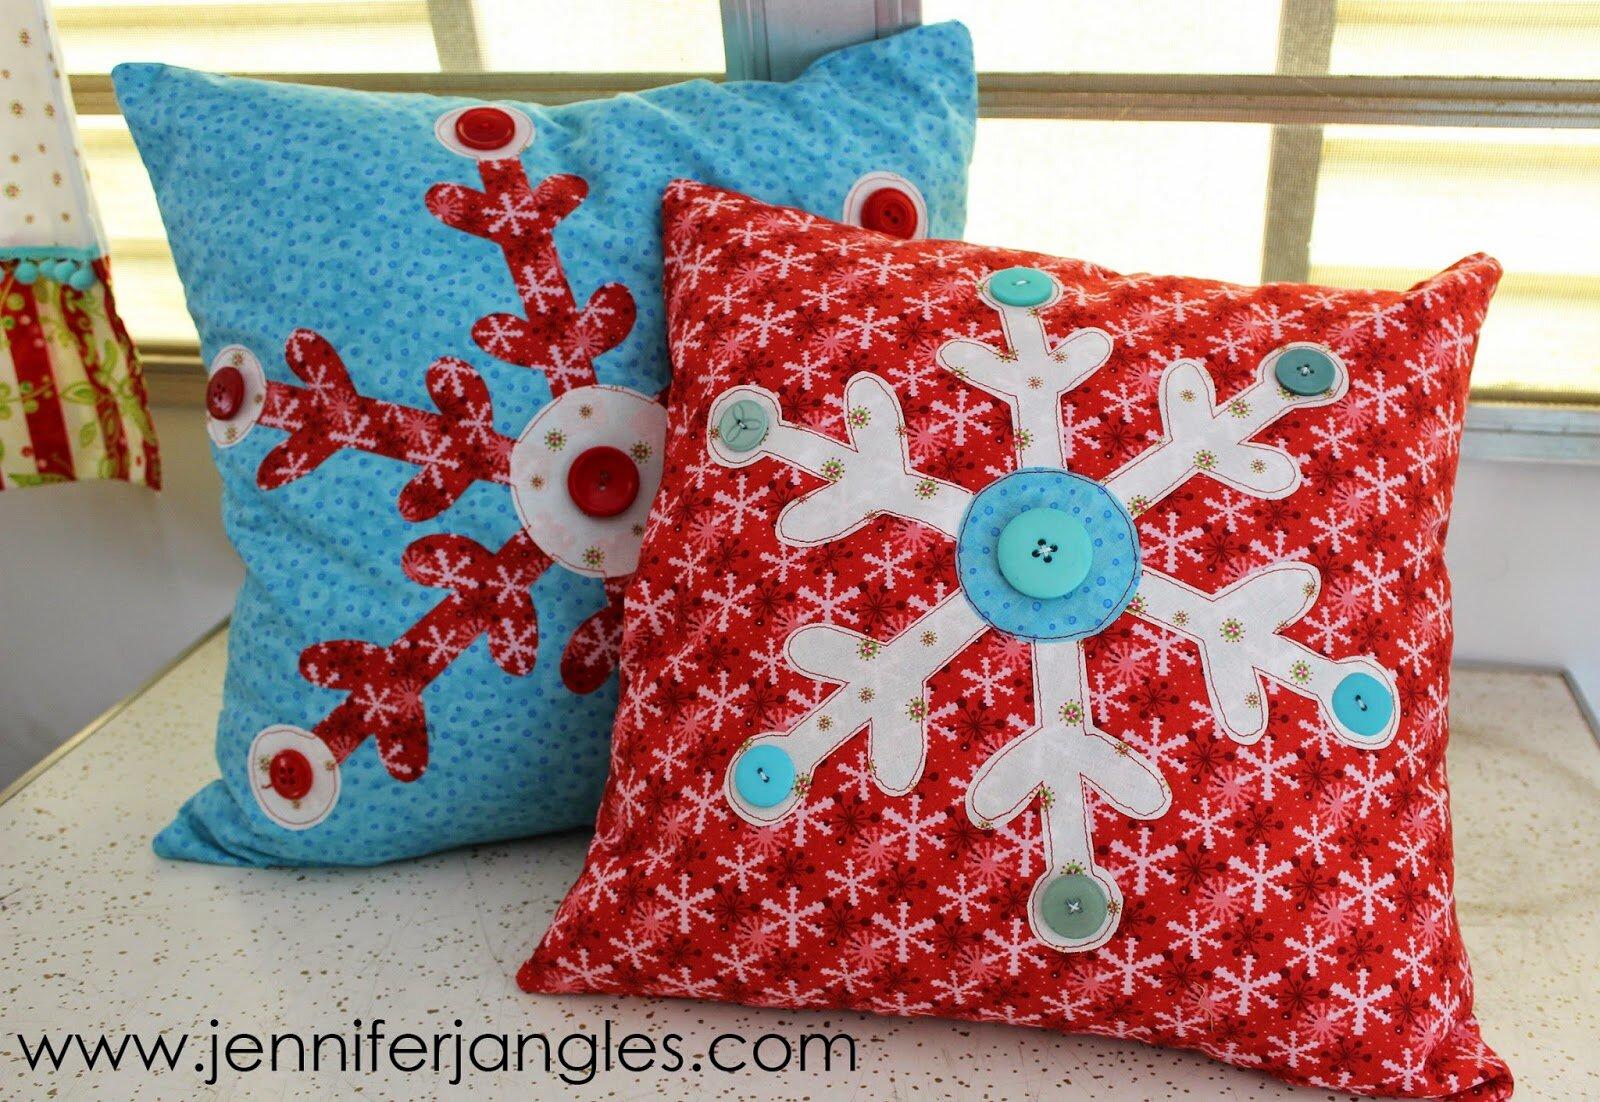 Snowflake pillows.jpg